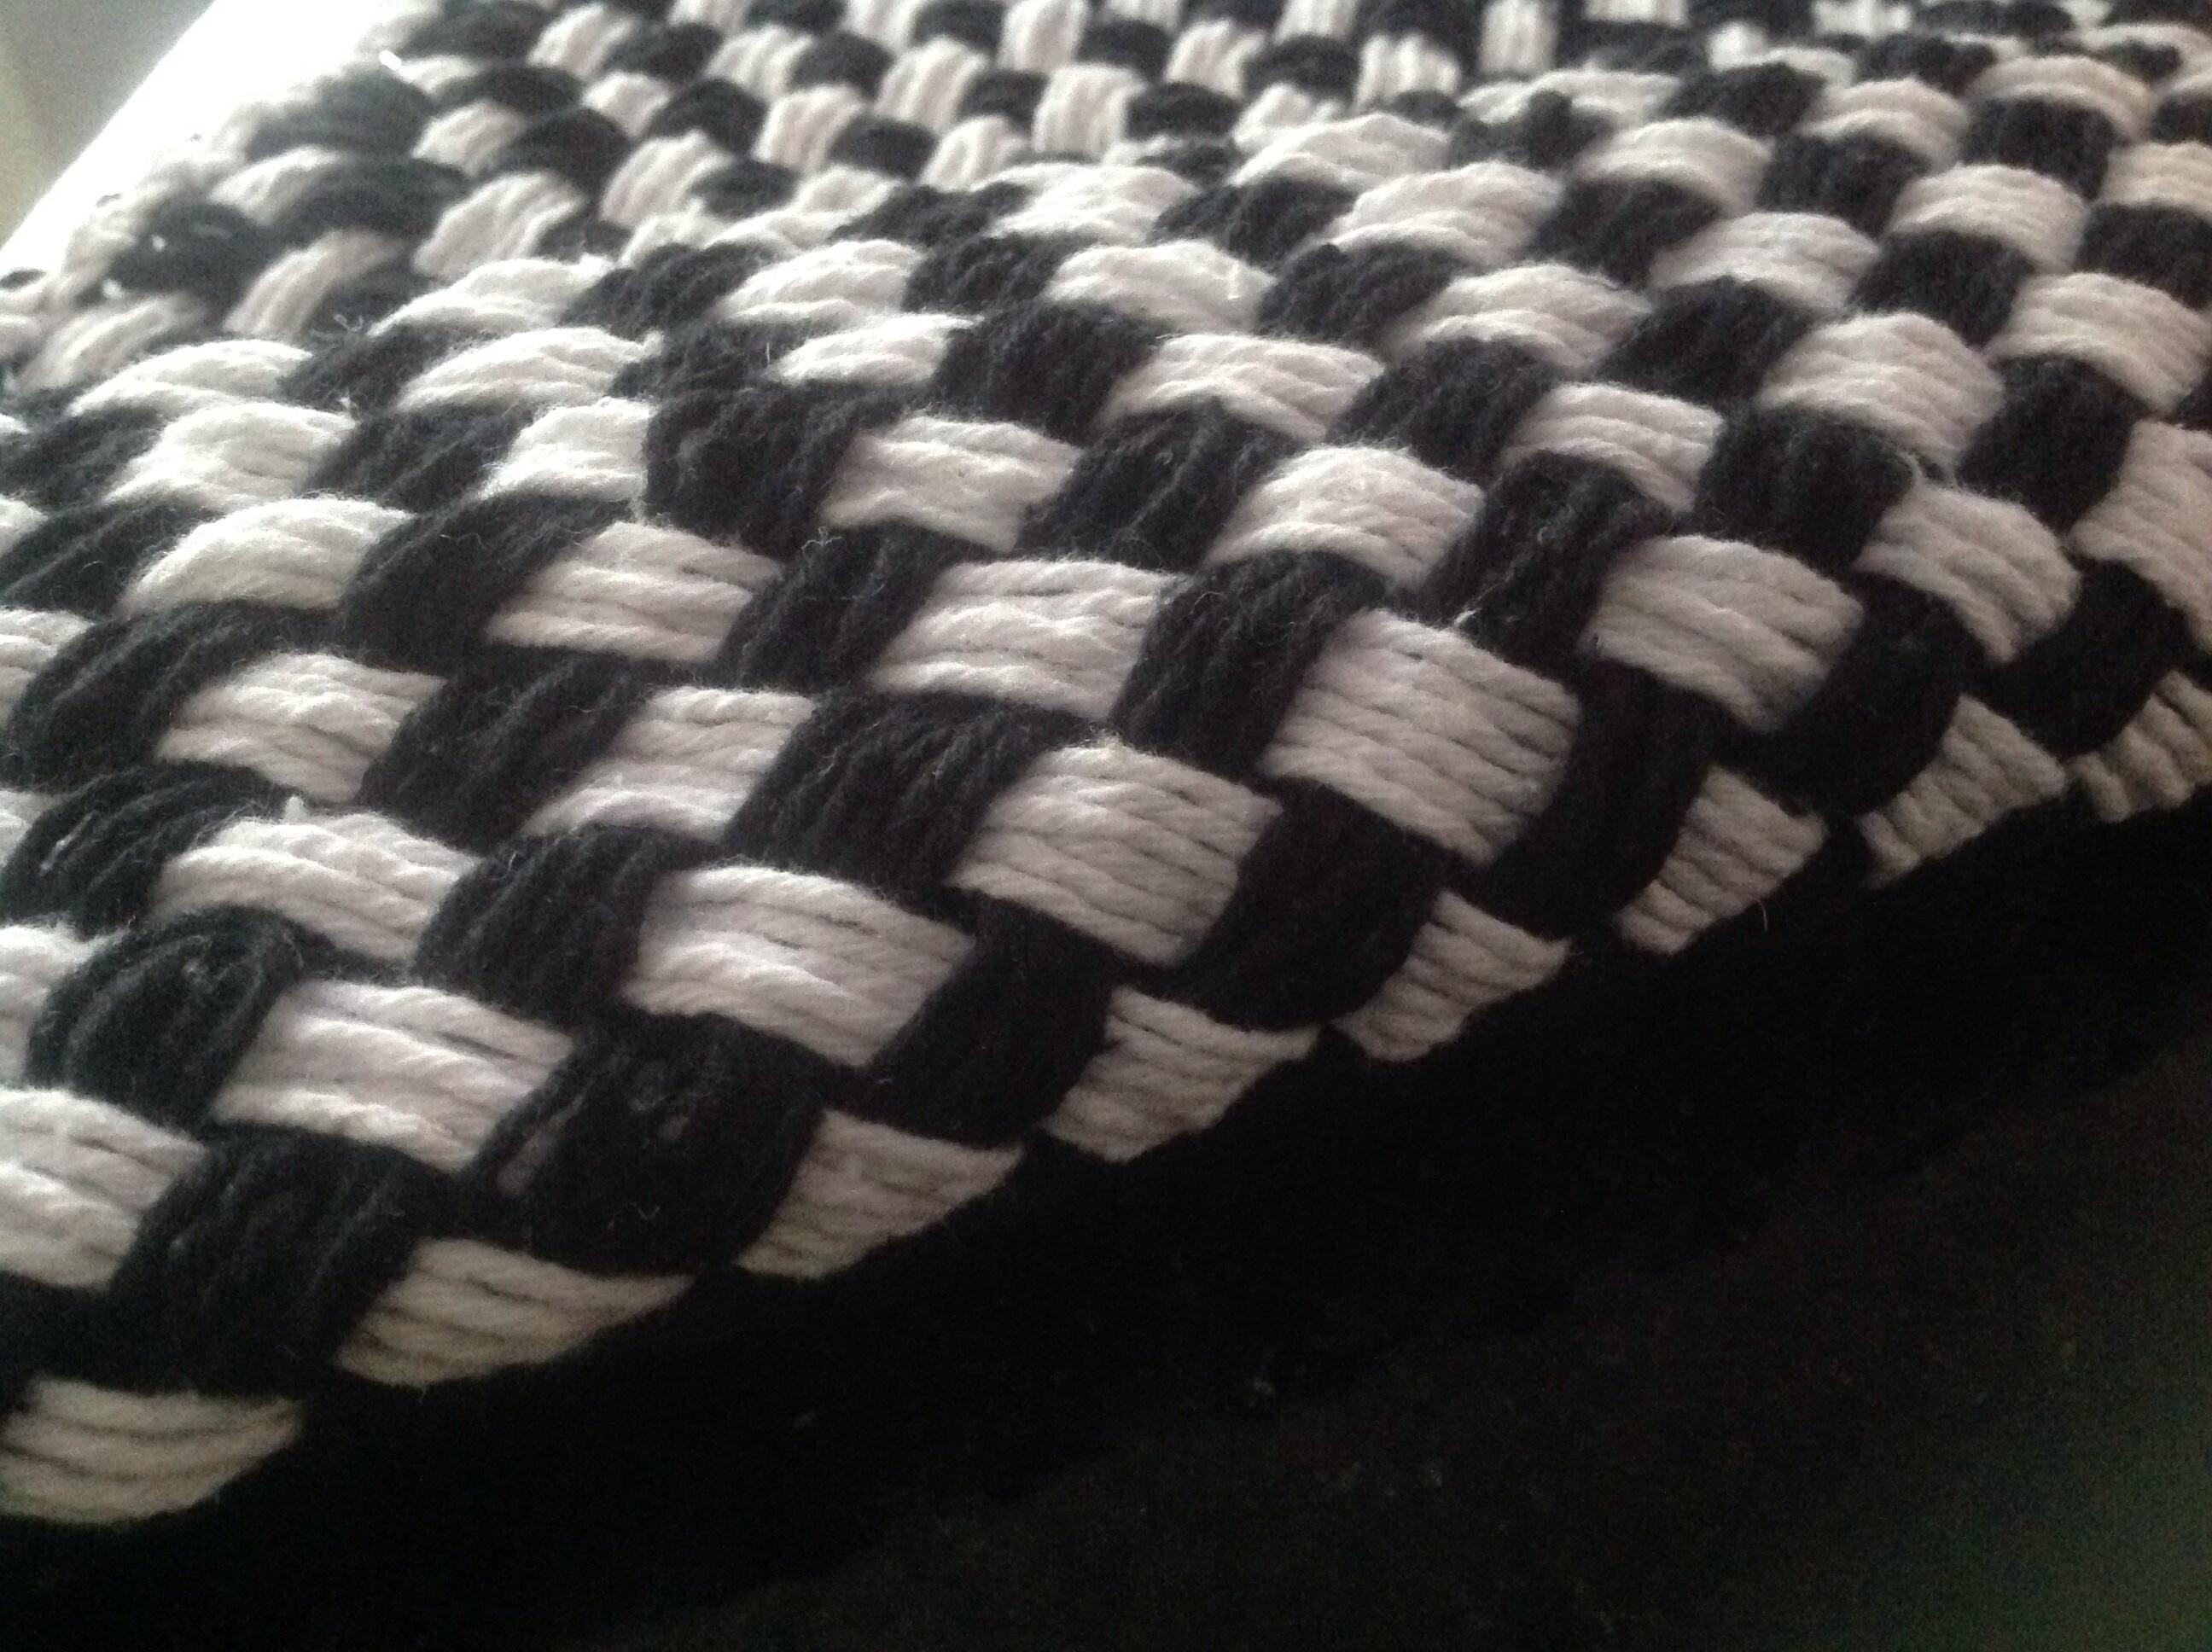 Arte Brasil Tapete Em Tear : Tapete xadrez feito no tear conj. 2unid. AmBel Artesanato Elo7